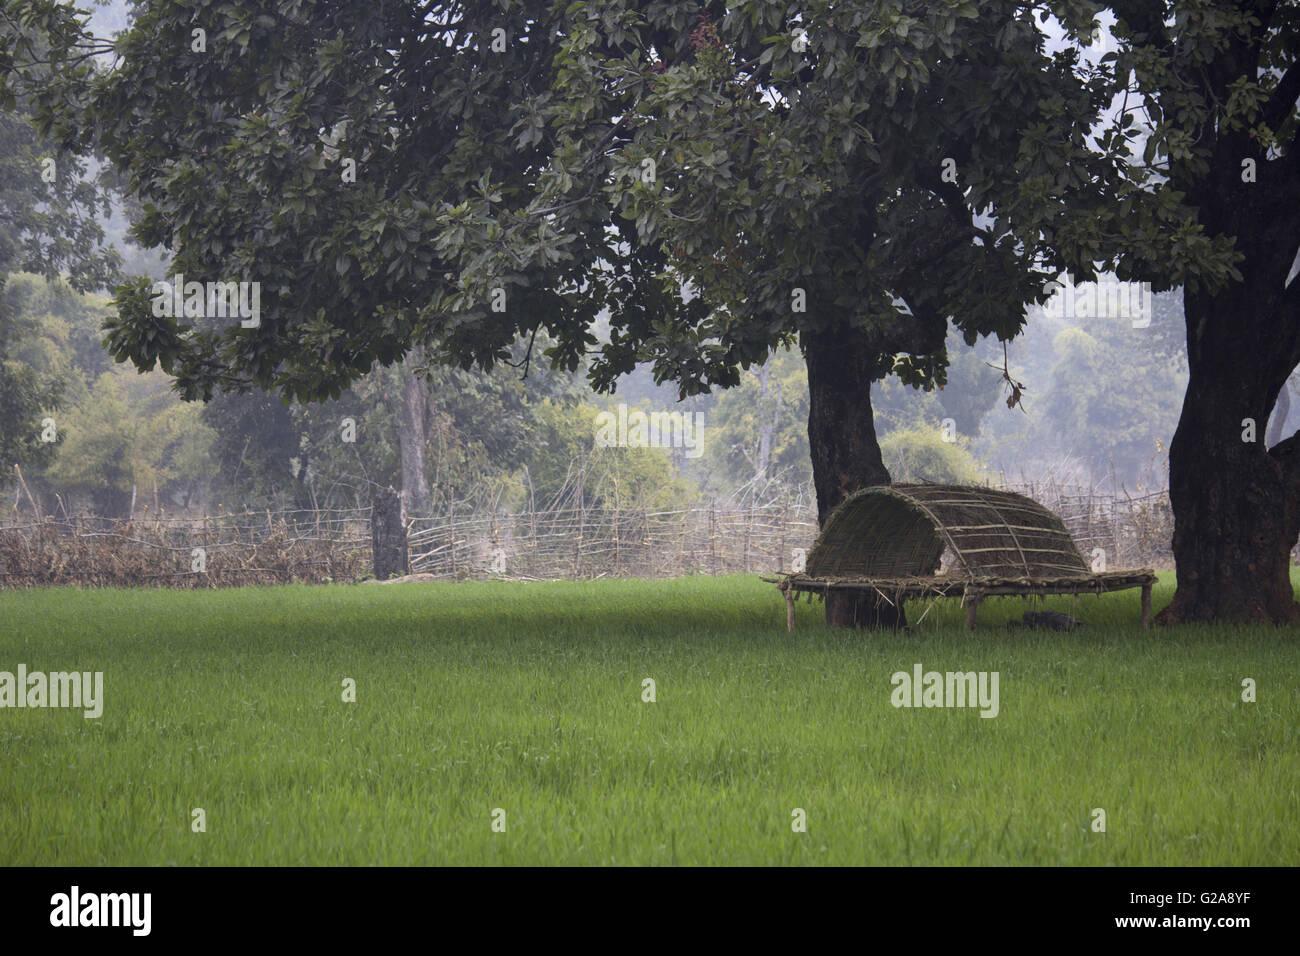 Fields and machan near bandhavgarh, Bandhavgarh Tiger Reserve outskirts, Madhya Pradesh, India Stock Photo